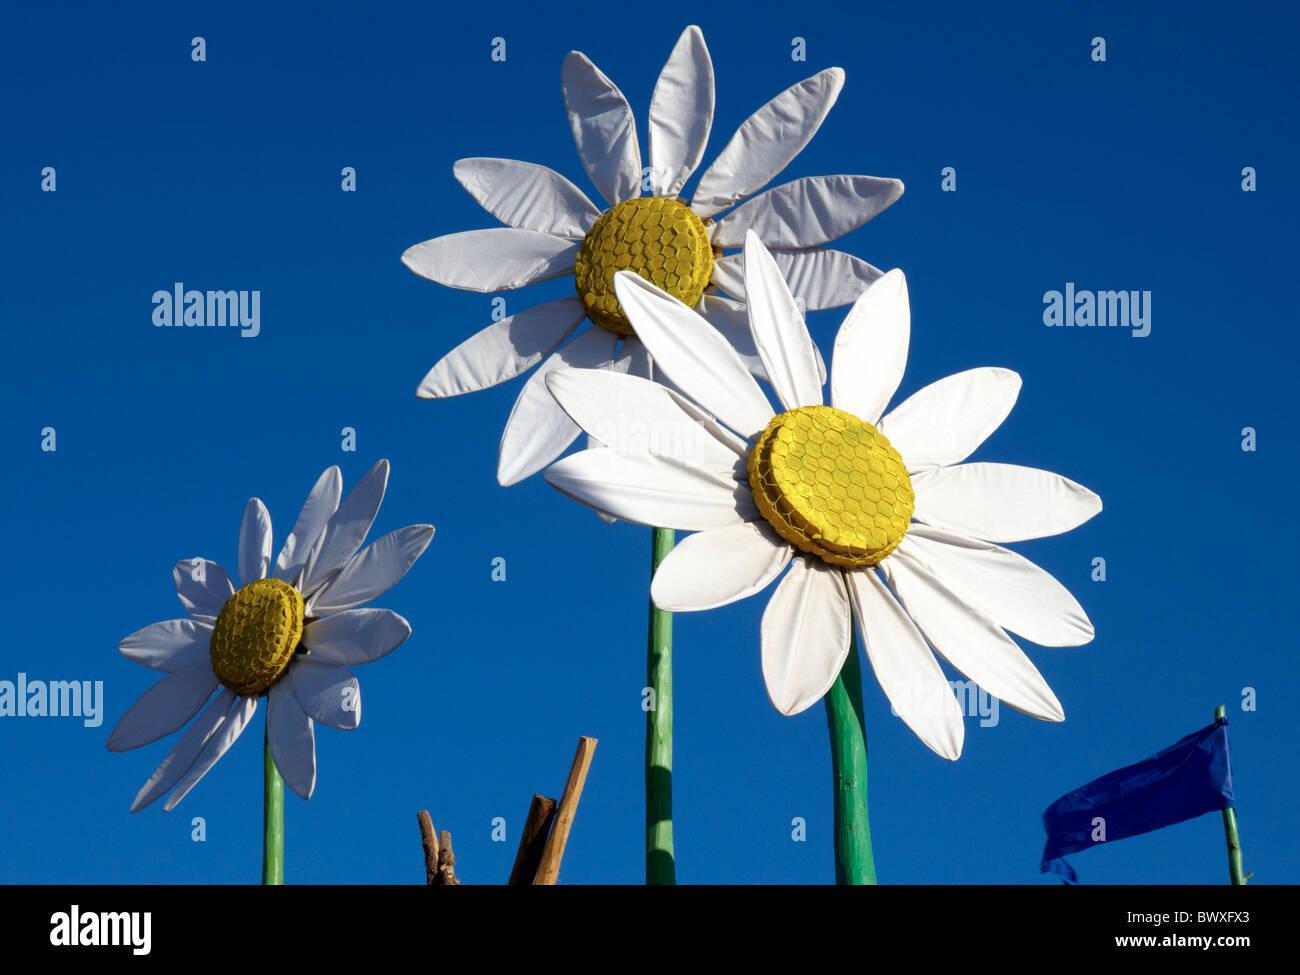 Giant Daisy Flowers Stock Photos Giant Daisy Flowers Stock Images